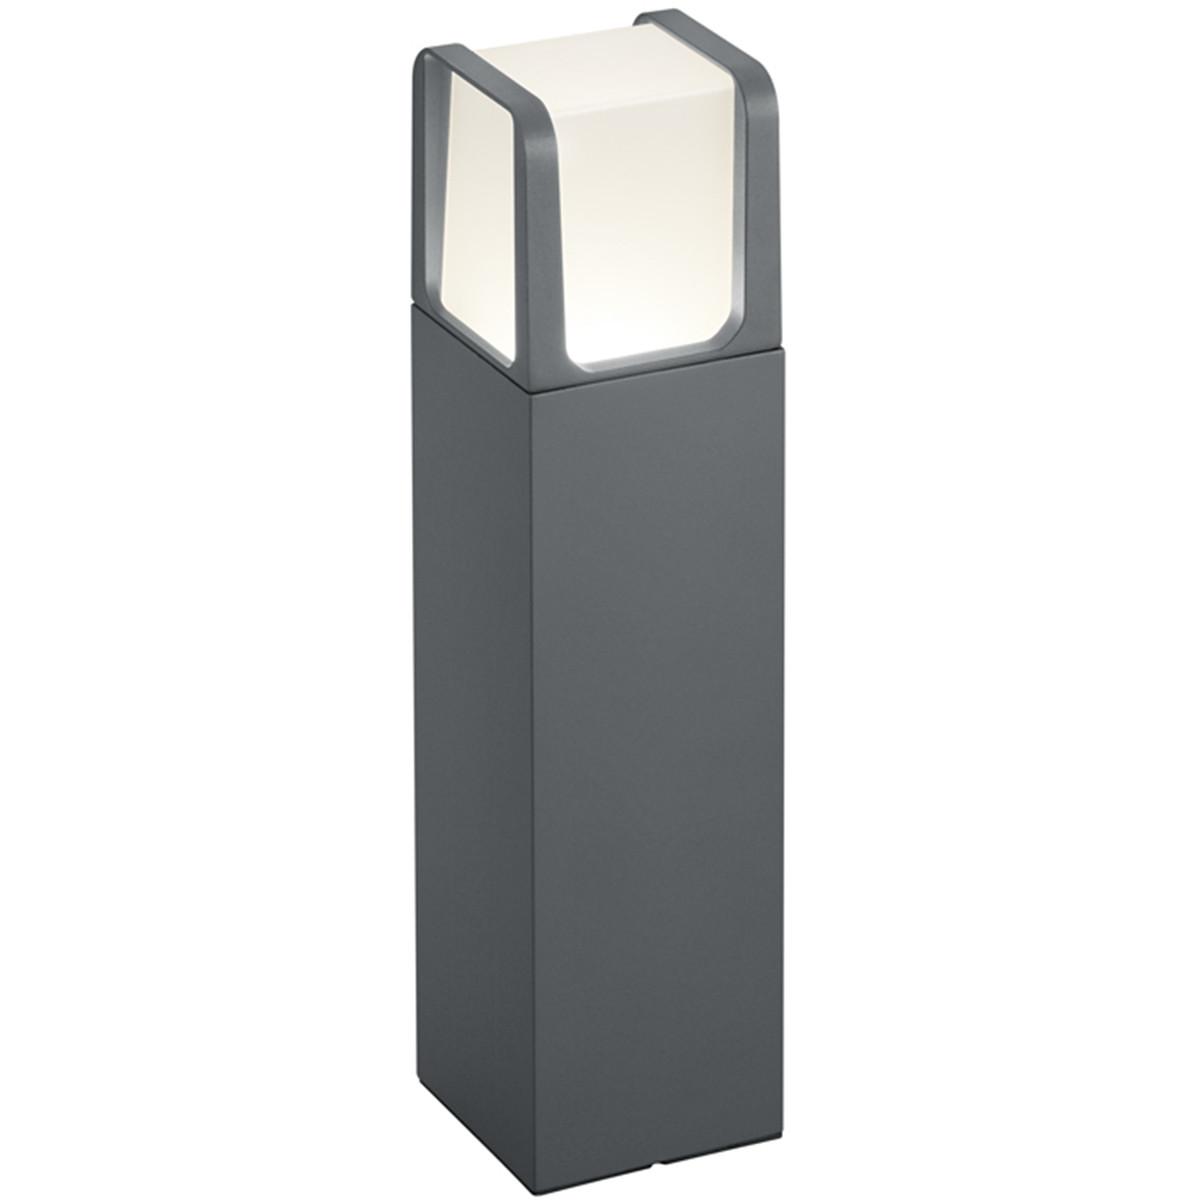 LED Tuinverlichting - Buitenlamp - Trion Ibroly - Staand - 6W - Mat Zwart - Aluminium